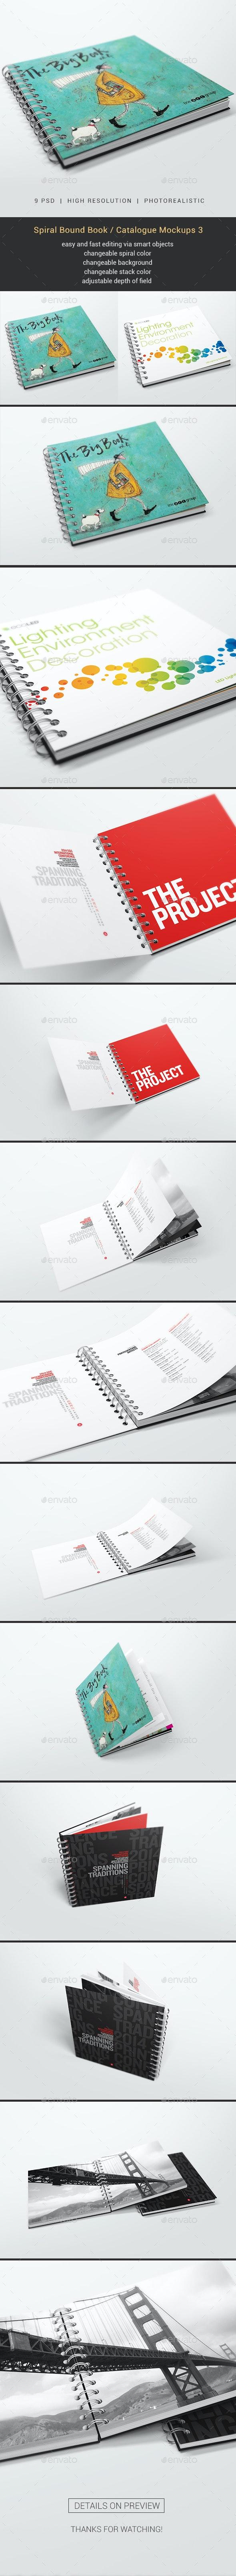 Spiral Bound Book / Catalogue Mockups 3 - Books Print